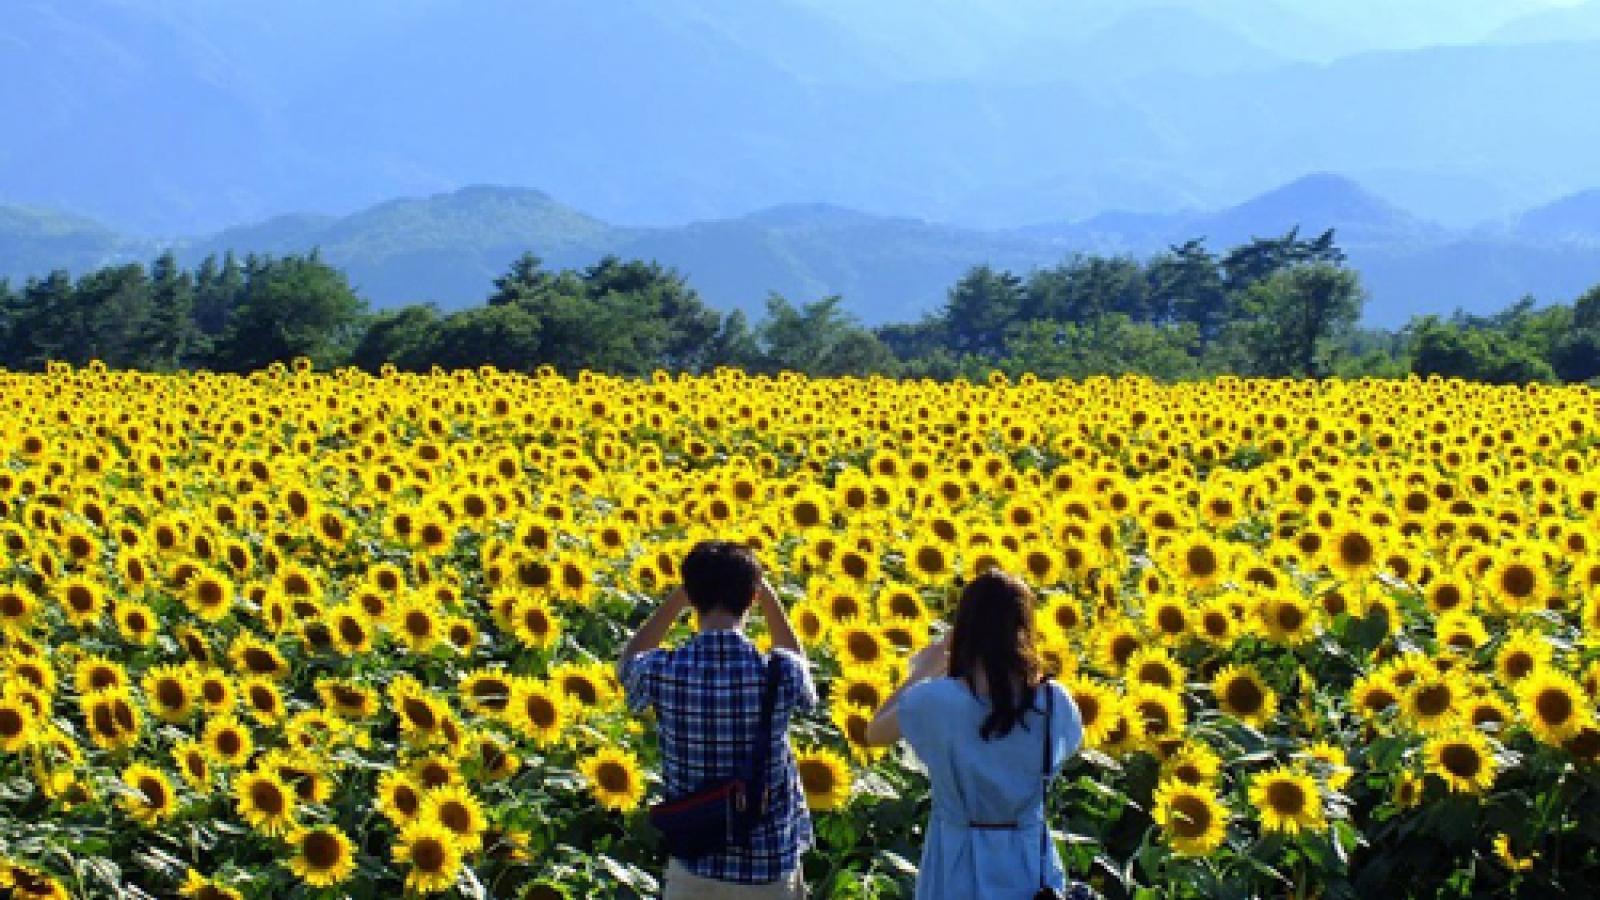 Sunflower fields abloom across northern Vietnam